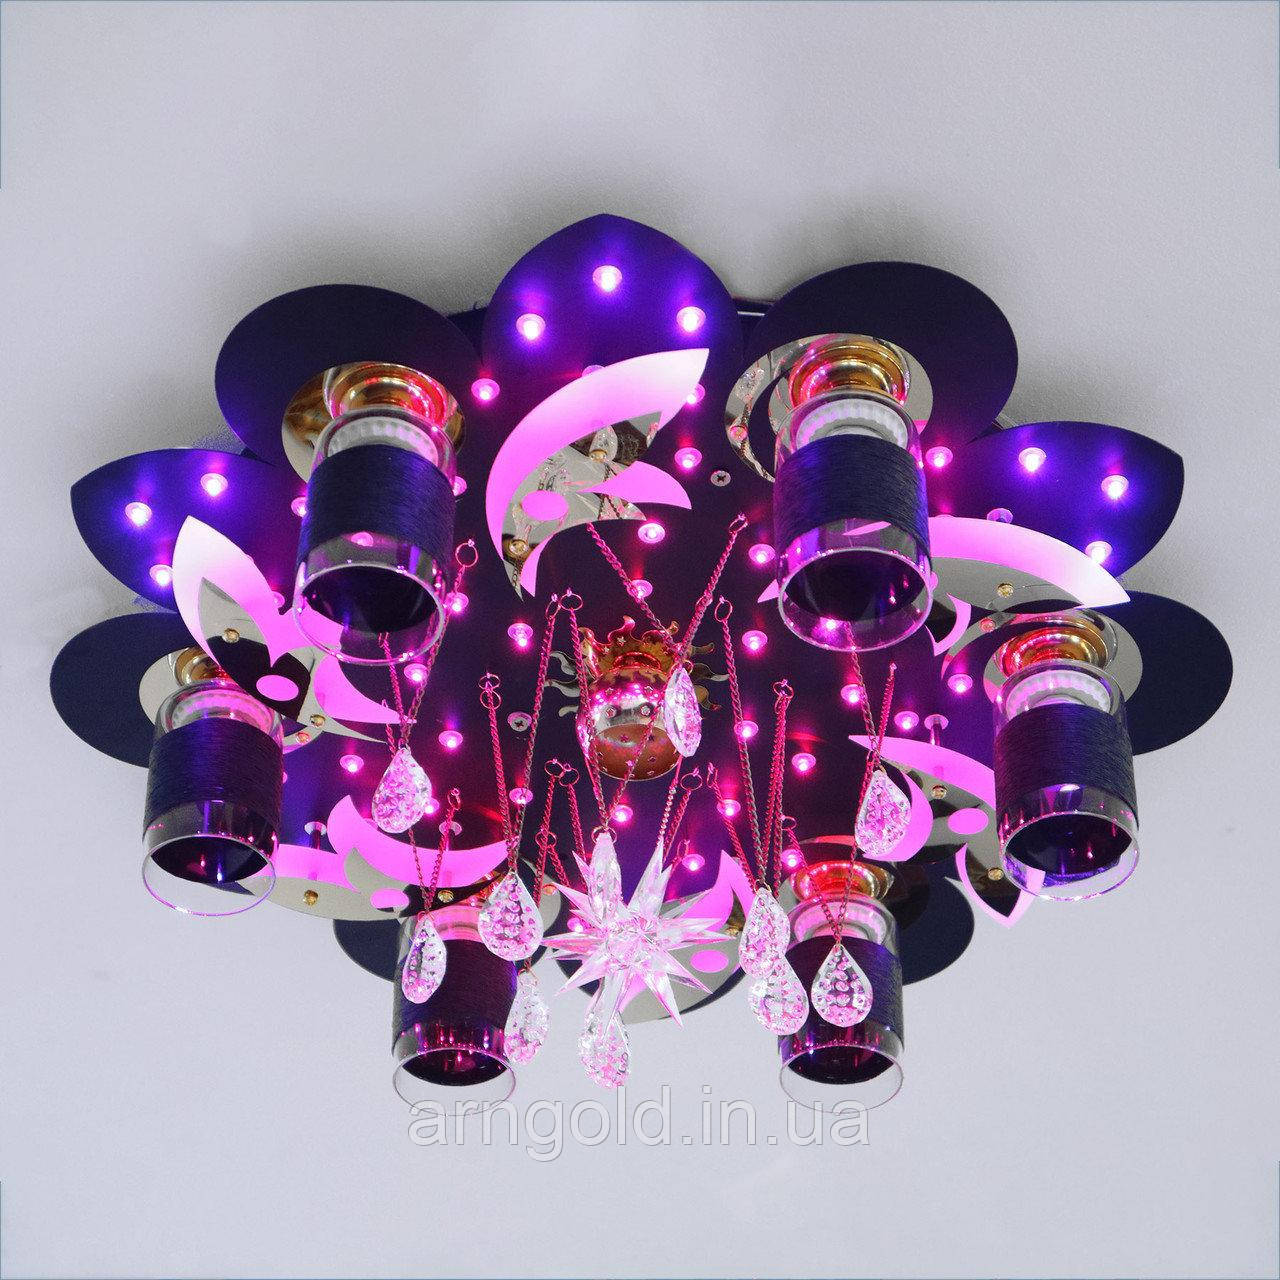 Люстра RGB LED Космос 5-70118/6+1 D600 BK